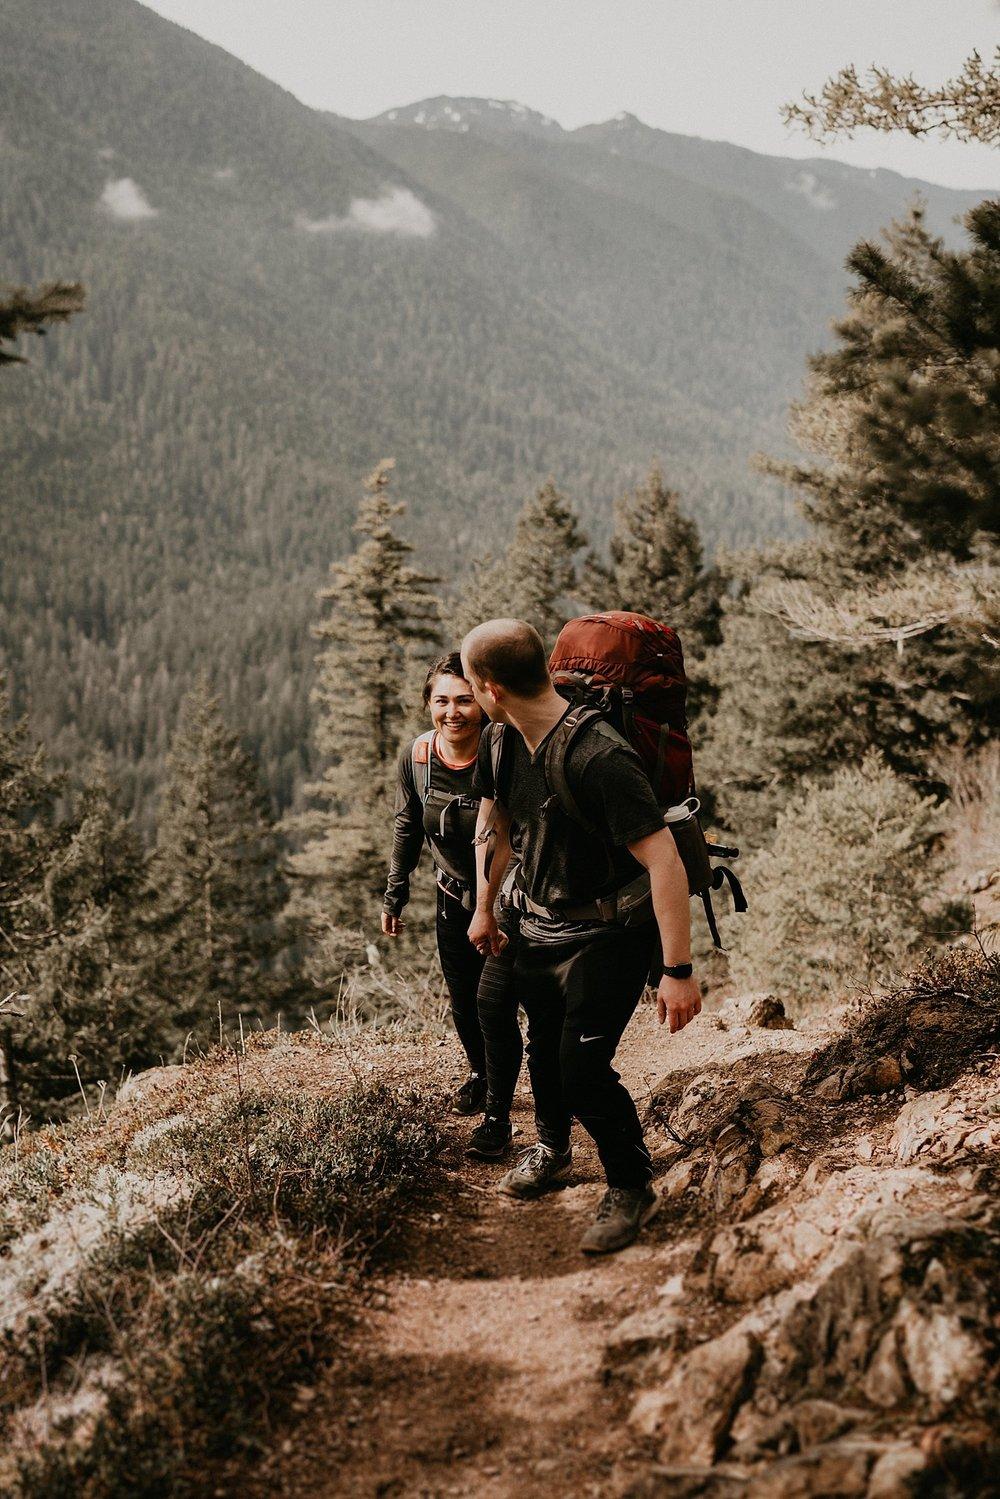 Lake-Crescent-Mount-Storm-King-Hiking-Adventure-Engagement-Seattle-Wedding-Photographer_0058.jpg